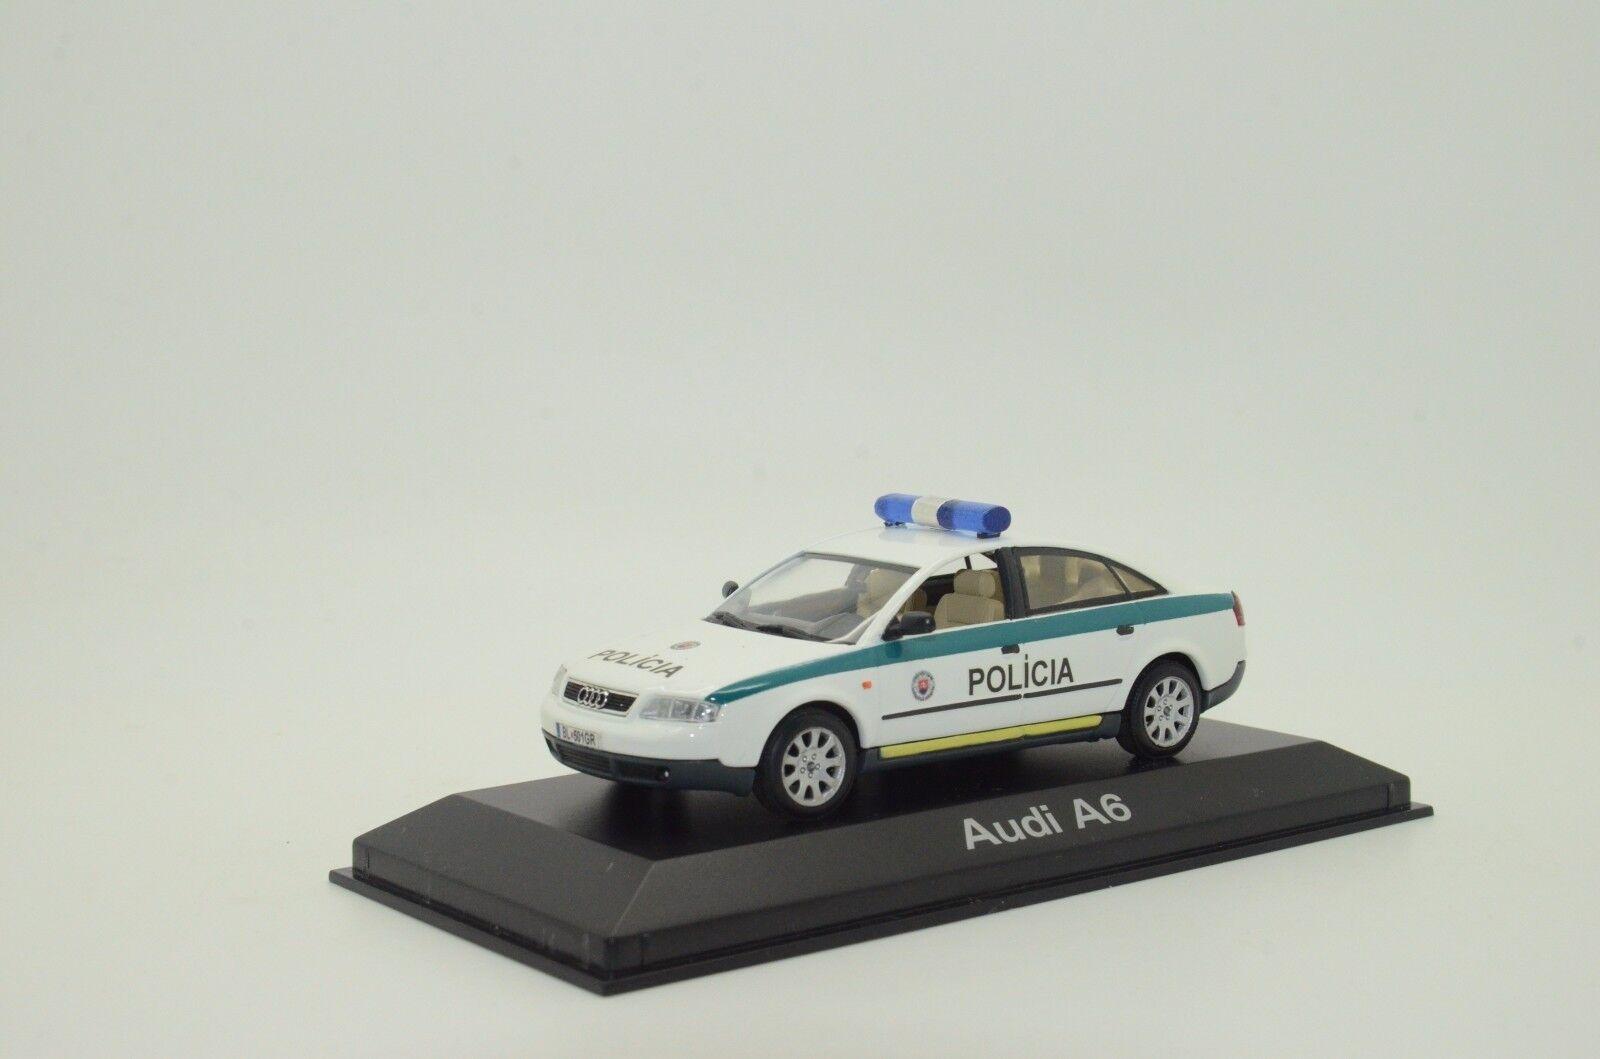 rara    Audi A6 POLICIA policía Eslovaquia Hecho a Medida 1 43